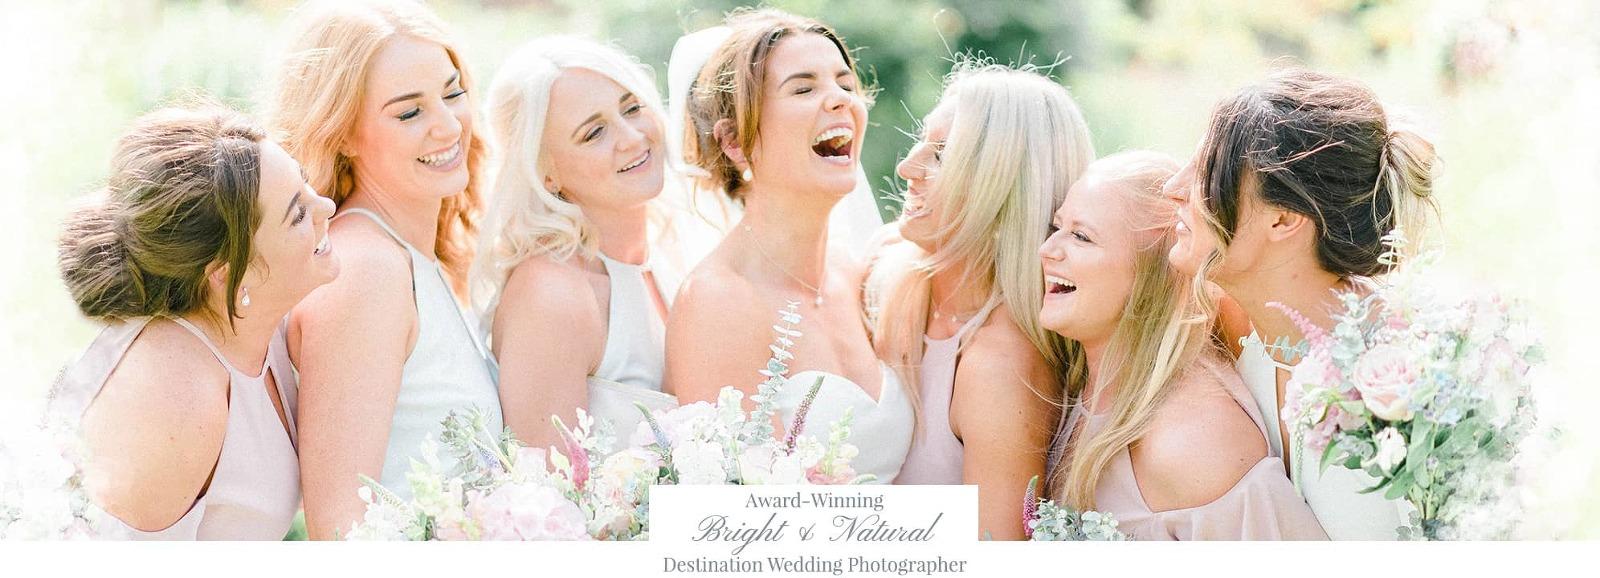 Bright and natural destination wedding photographer header - bridesmaids laughing